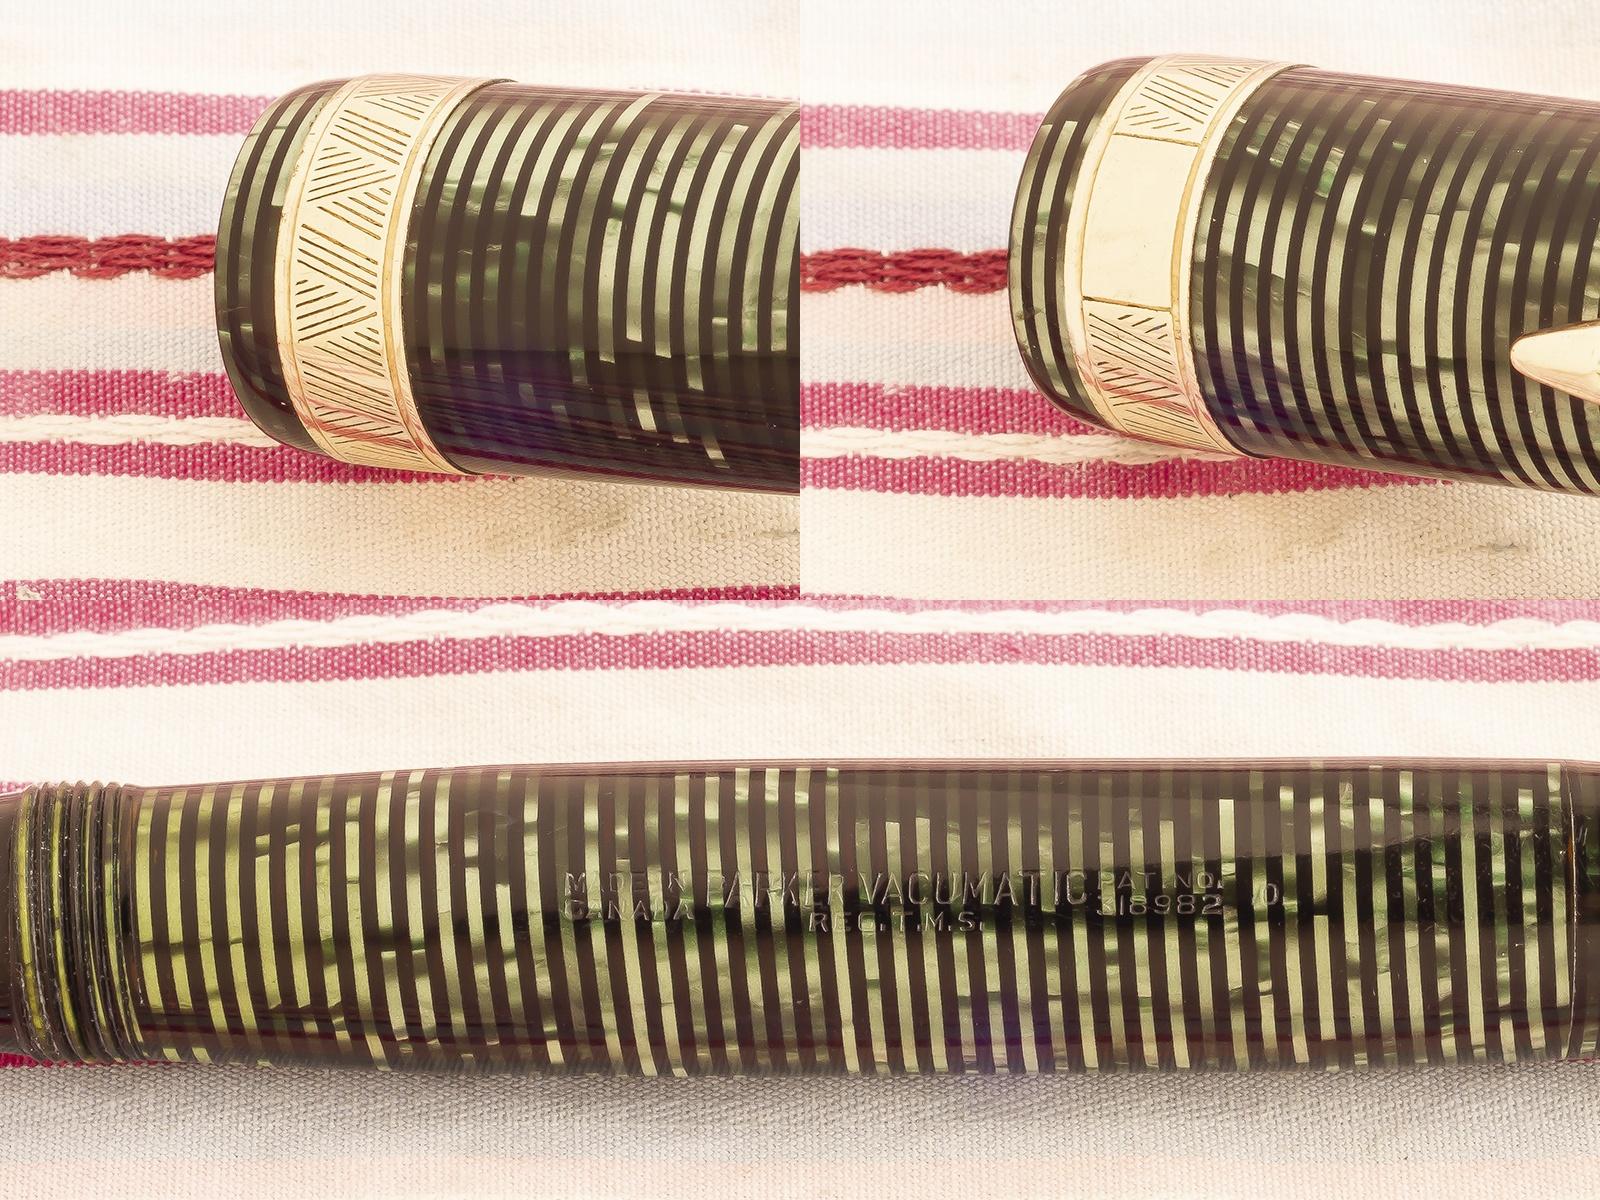 vintage parker vacumatic maxima senior green pearl striped amber semi-transparent marble broad gold chevron capband double jewel speedline filler fountain pen